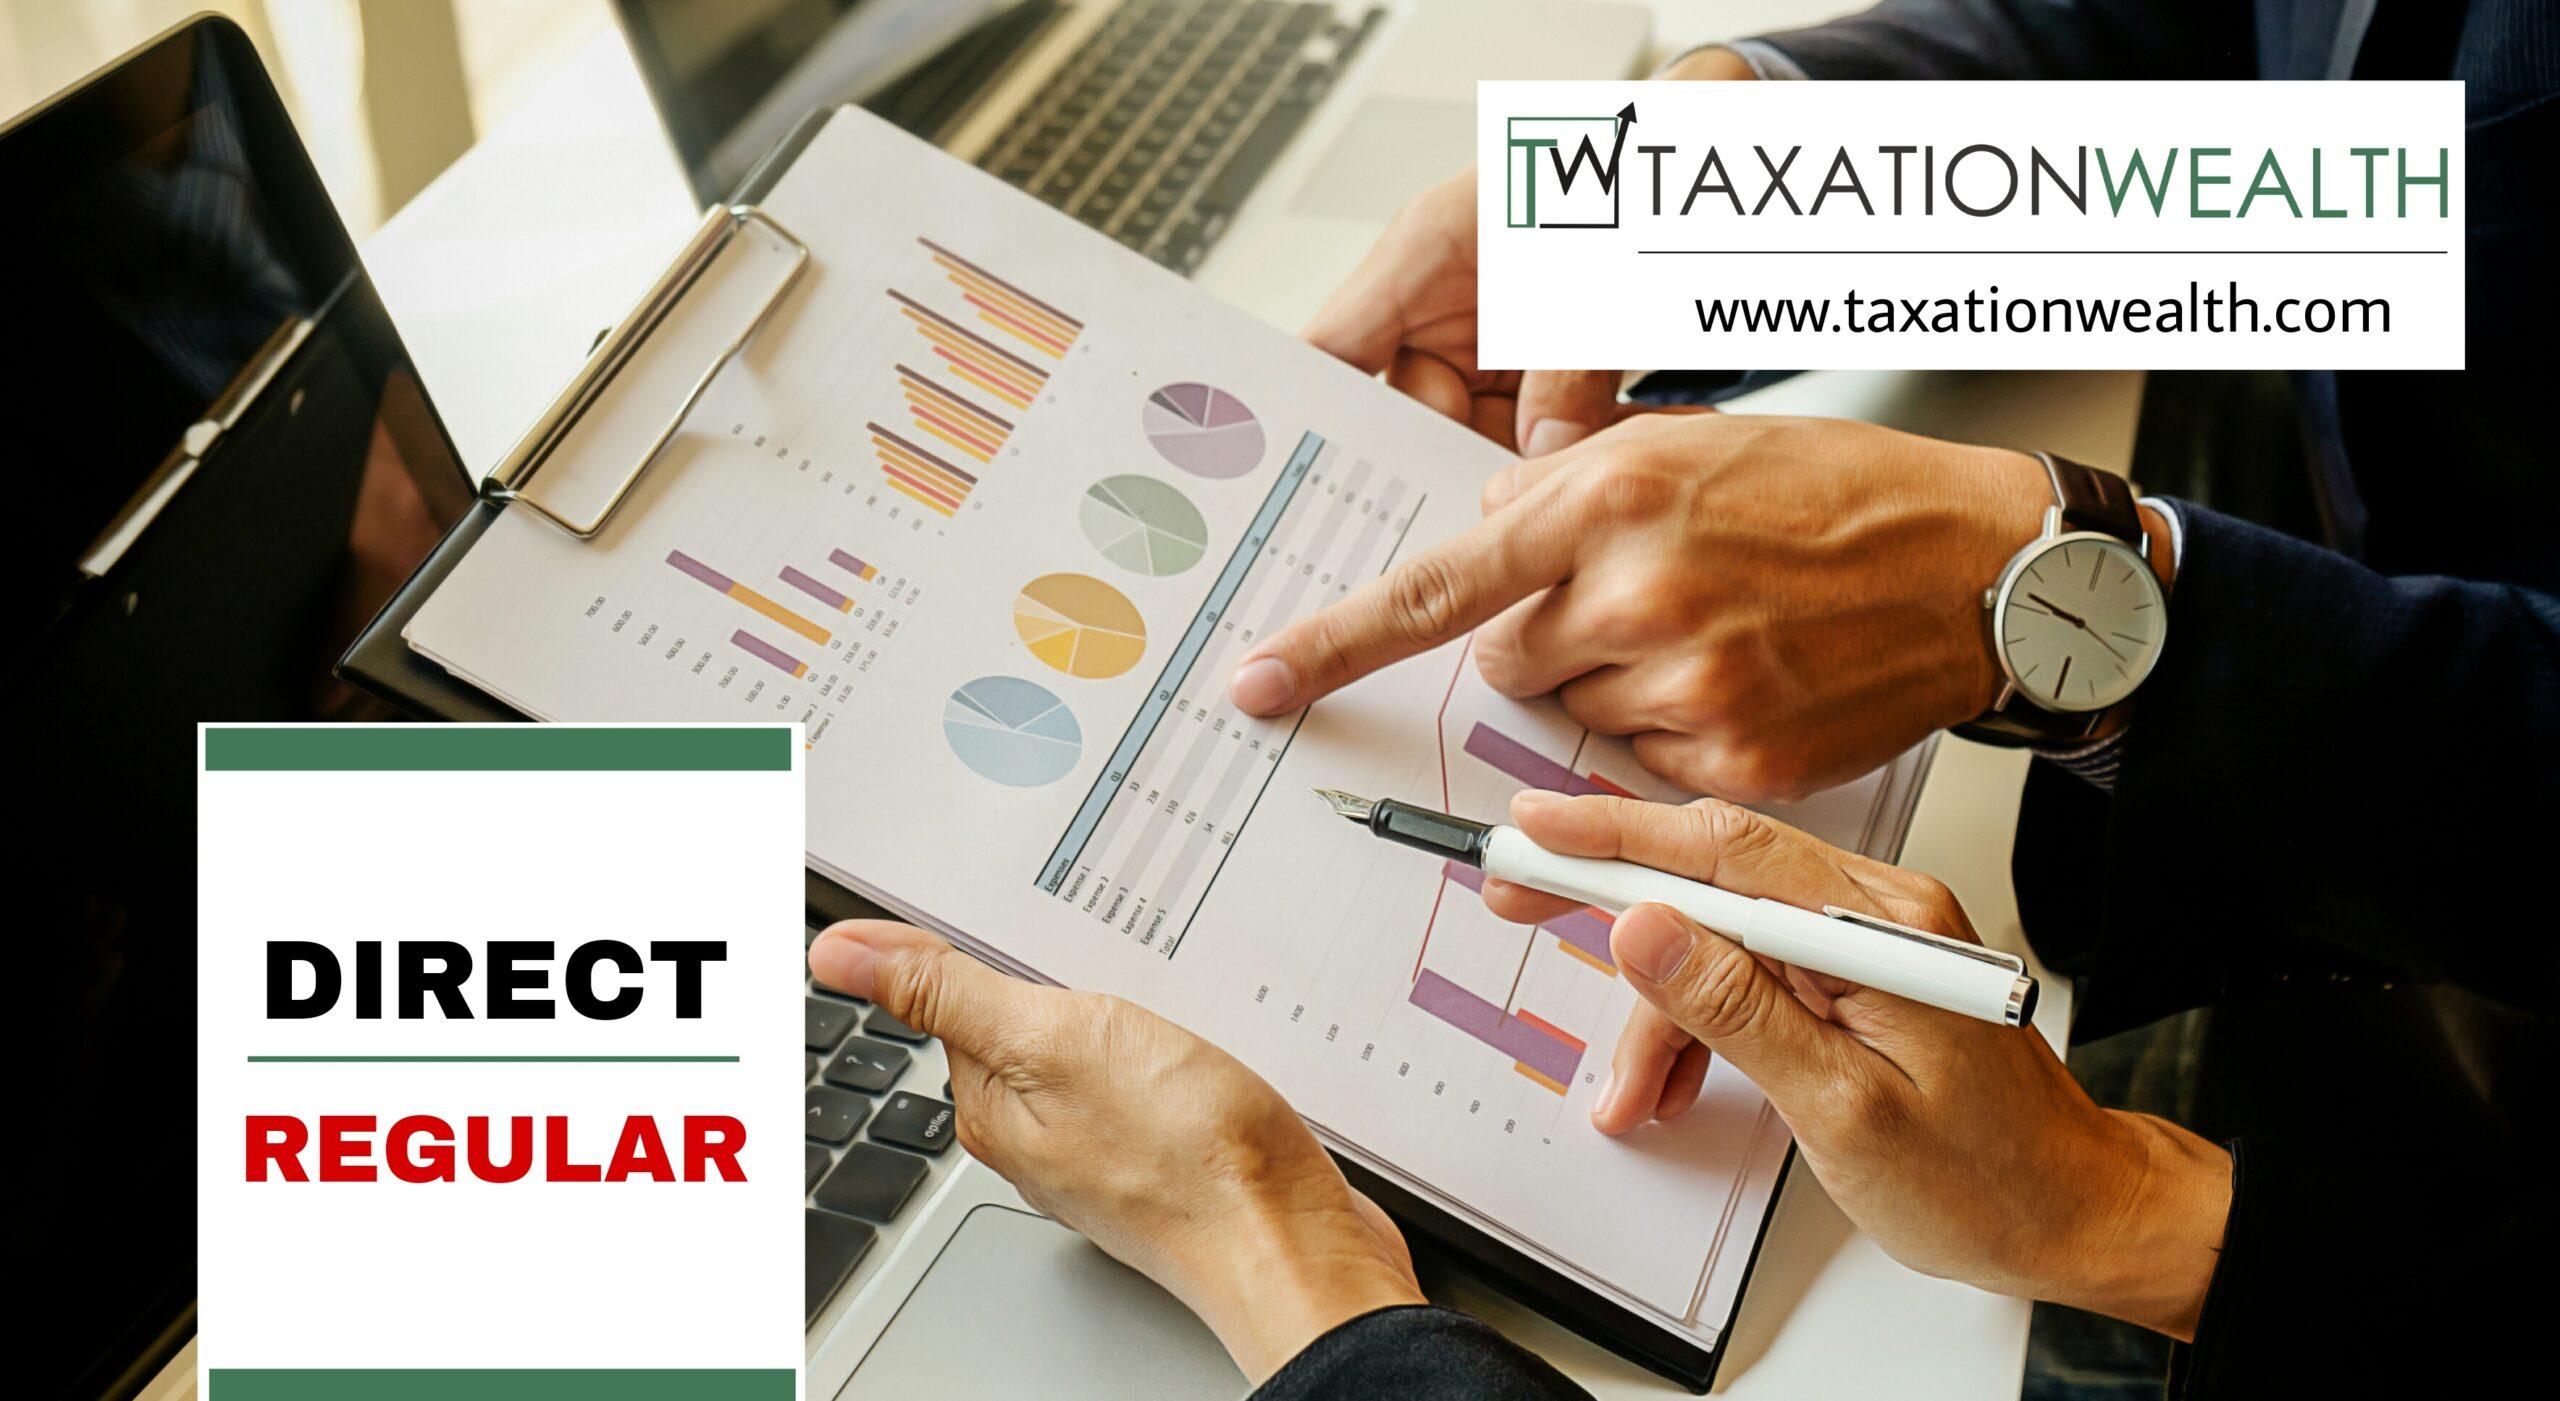 Mutual Funds(DIRECT OR REGULAR) - Taxationwealth